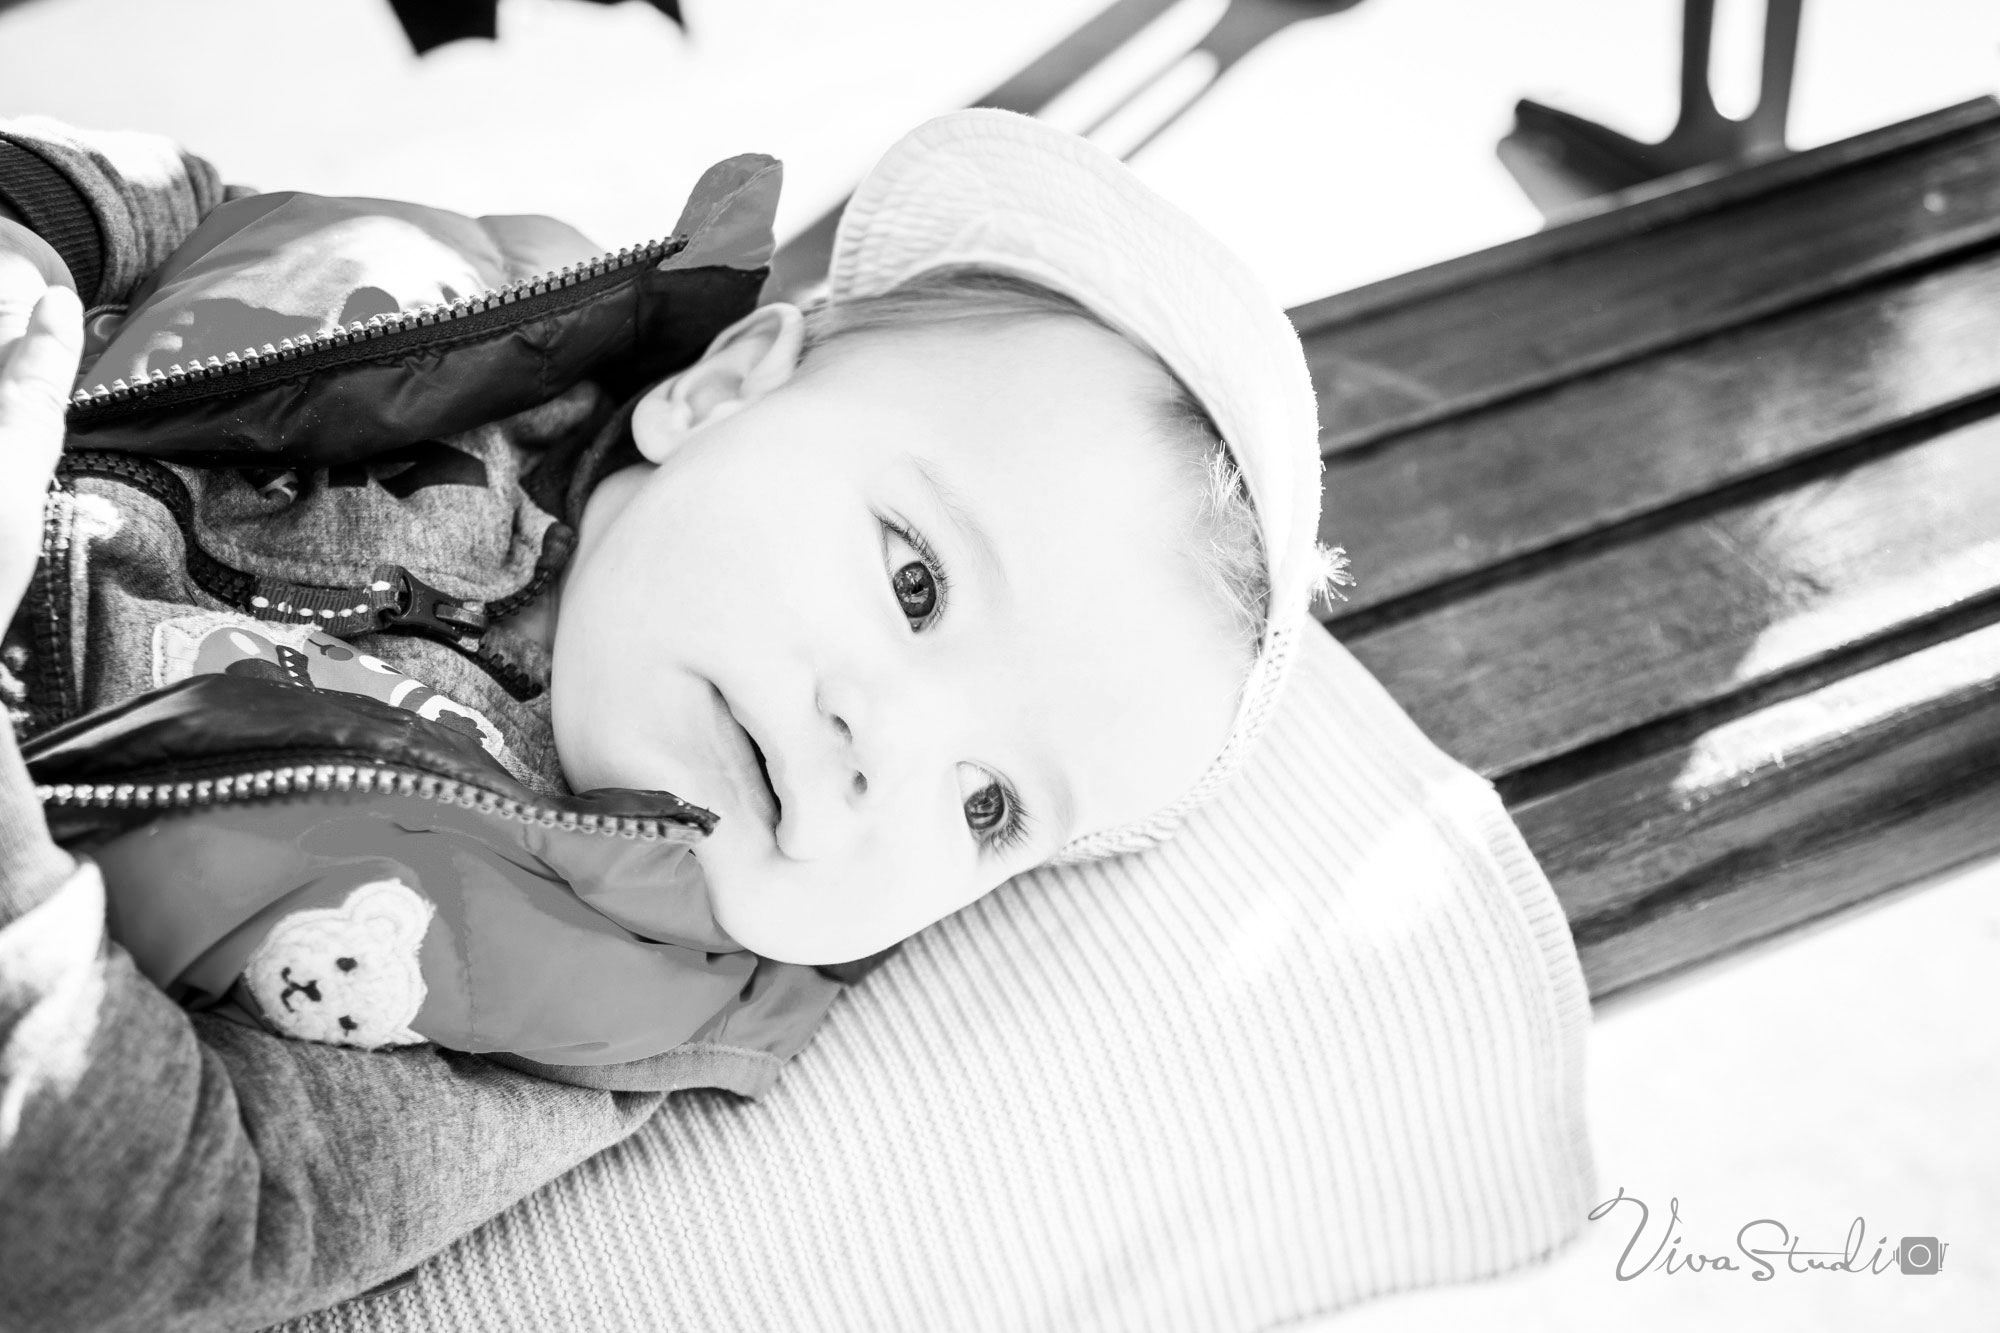 VivaStudio_Baby_Photography_Portrait_Newfarm_Park12